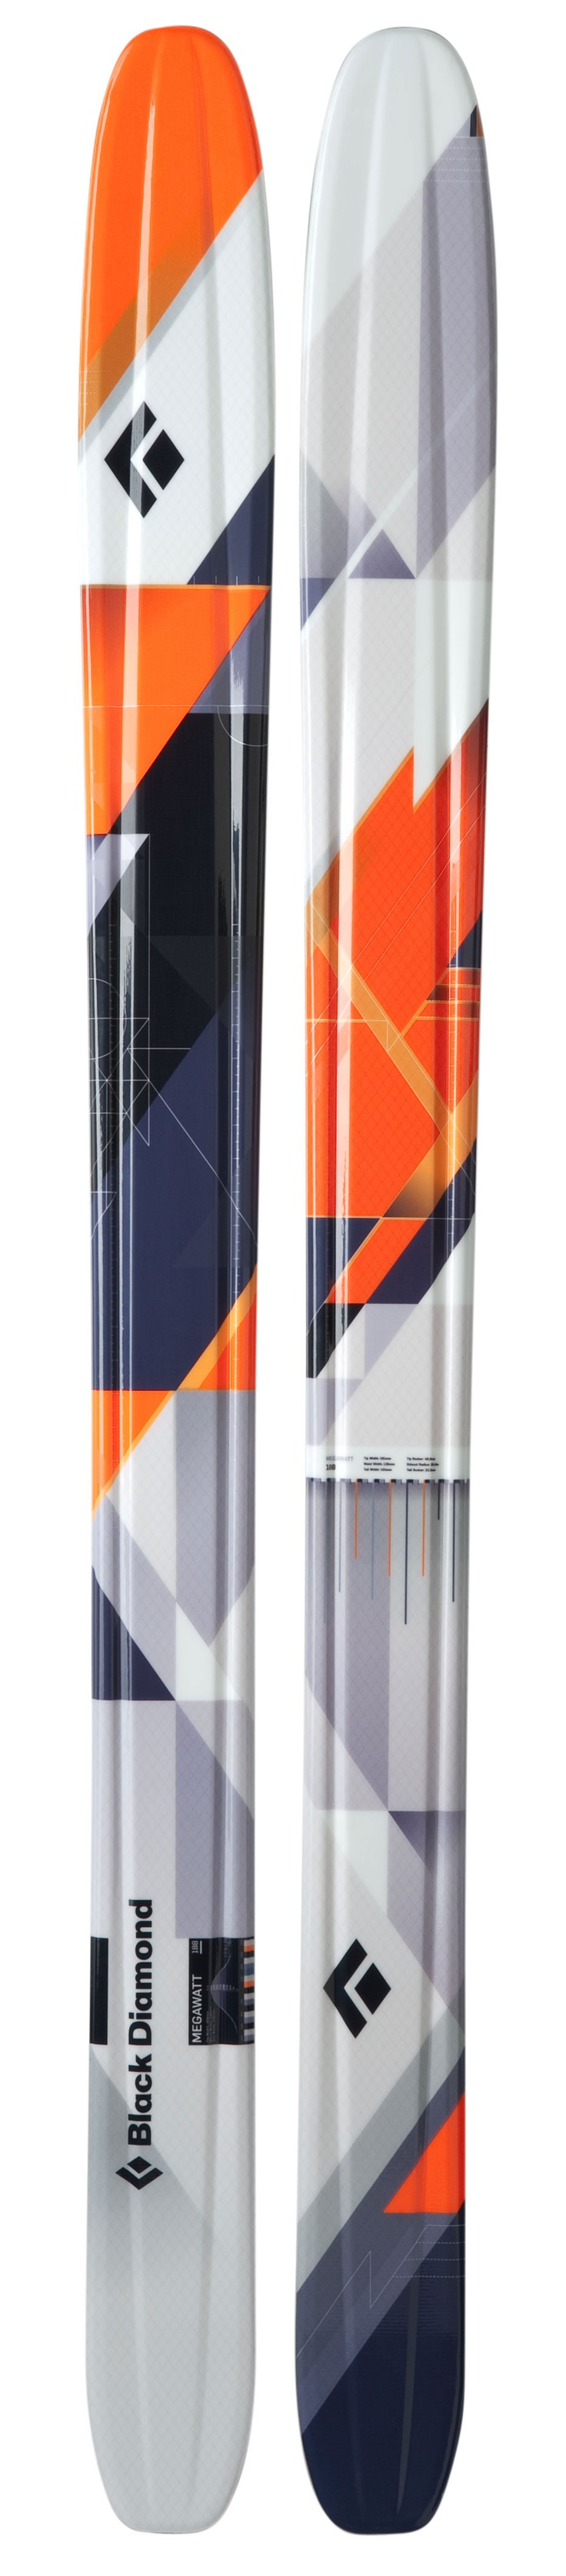 Or Maybe these....Megawatt Ski - Black Diamond Ski Gear